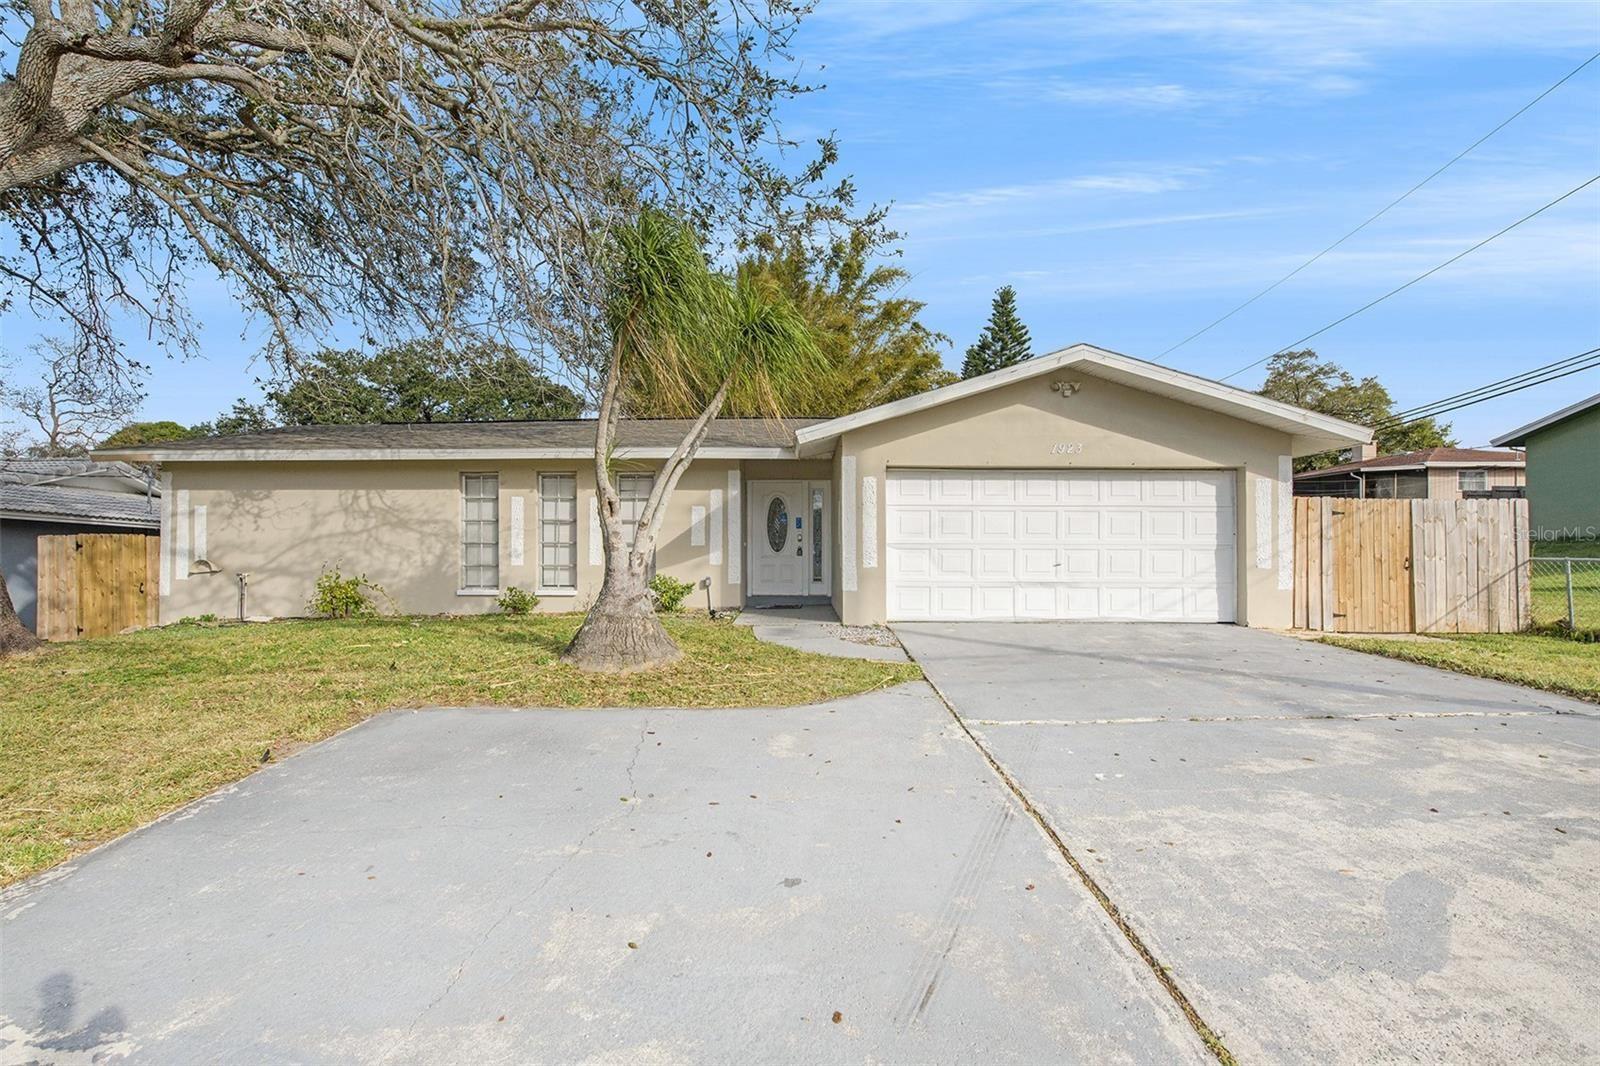 1923 N HIGHLAND AVENUE, Clearwater, FL 33755 - #: O5969063